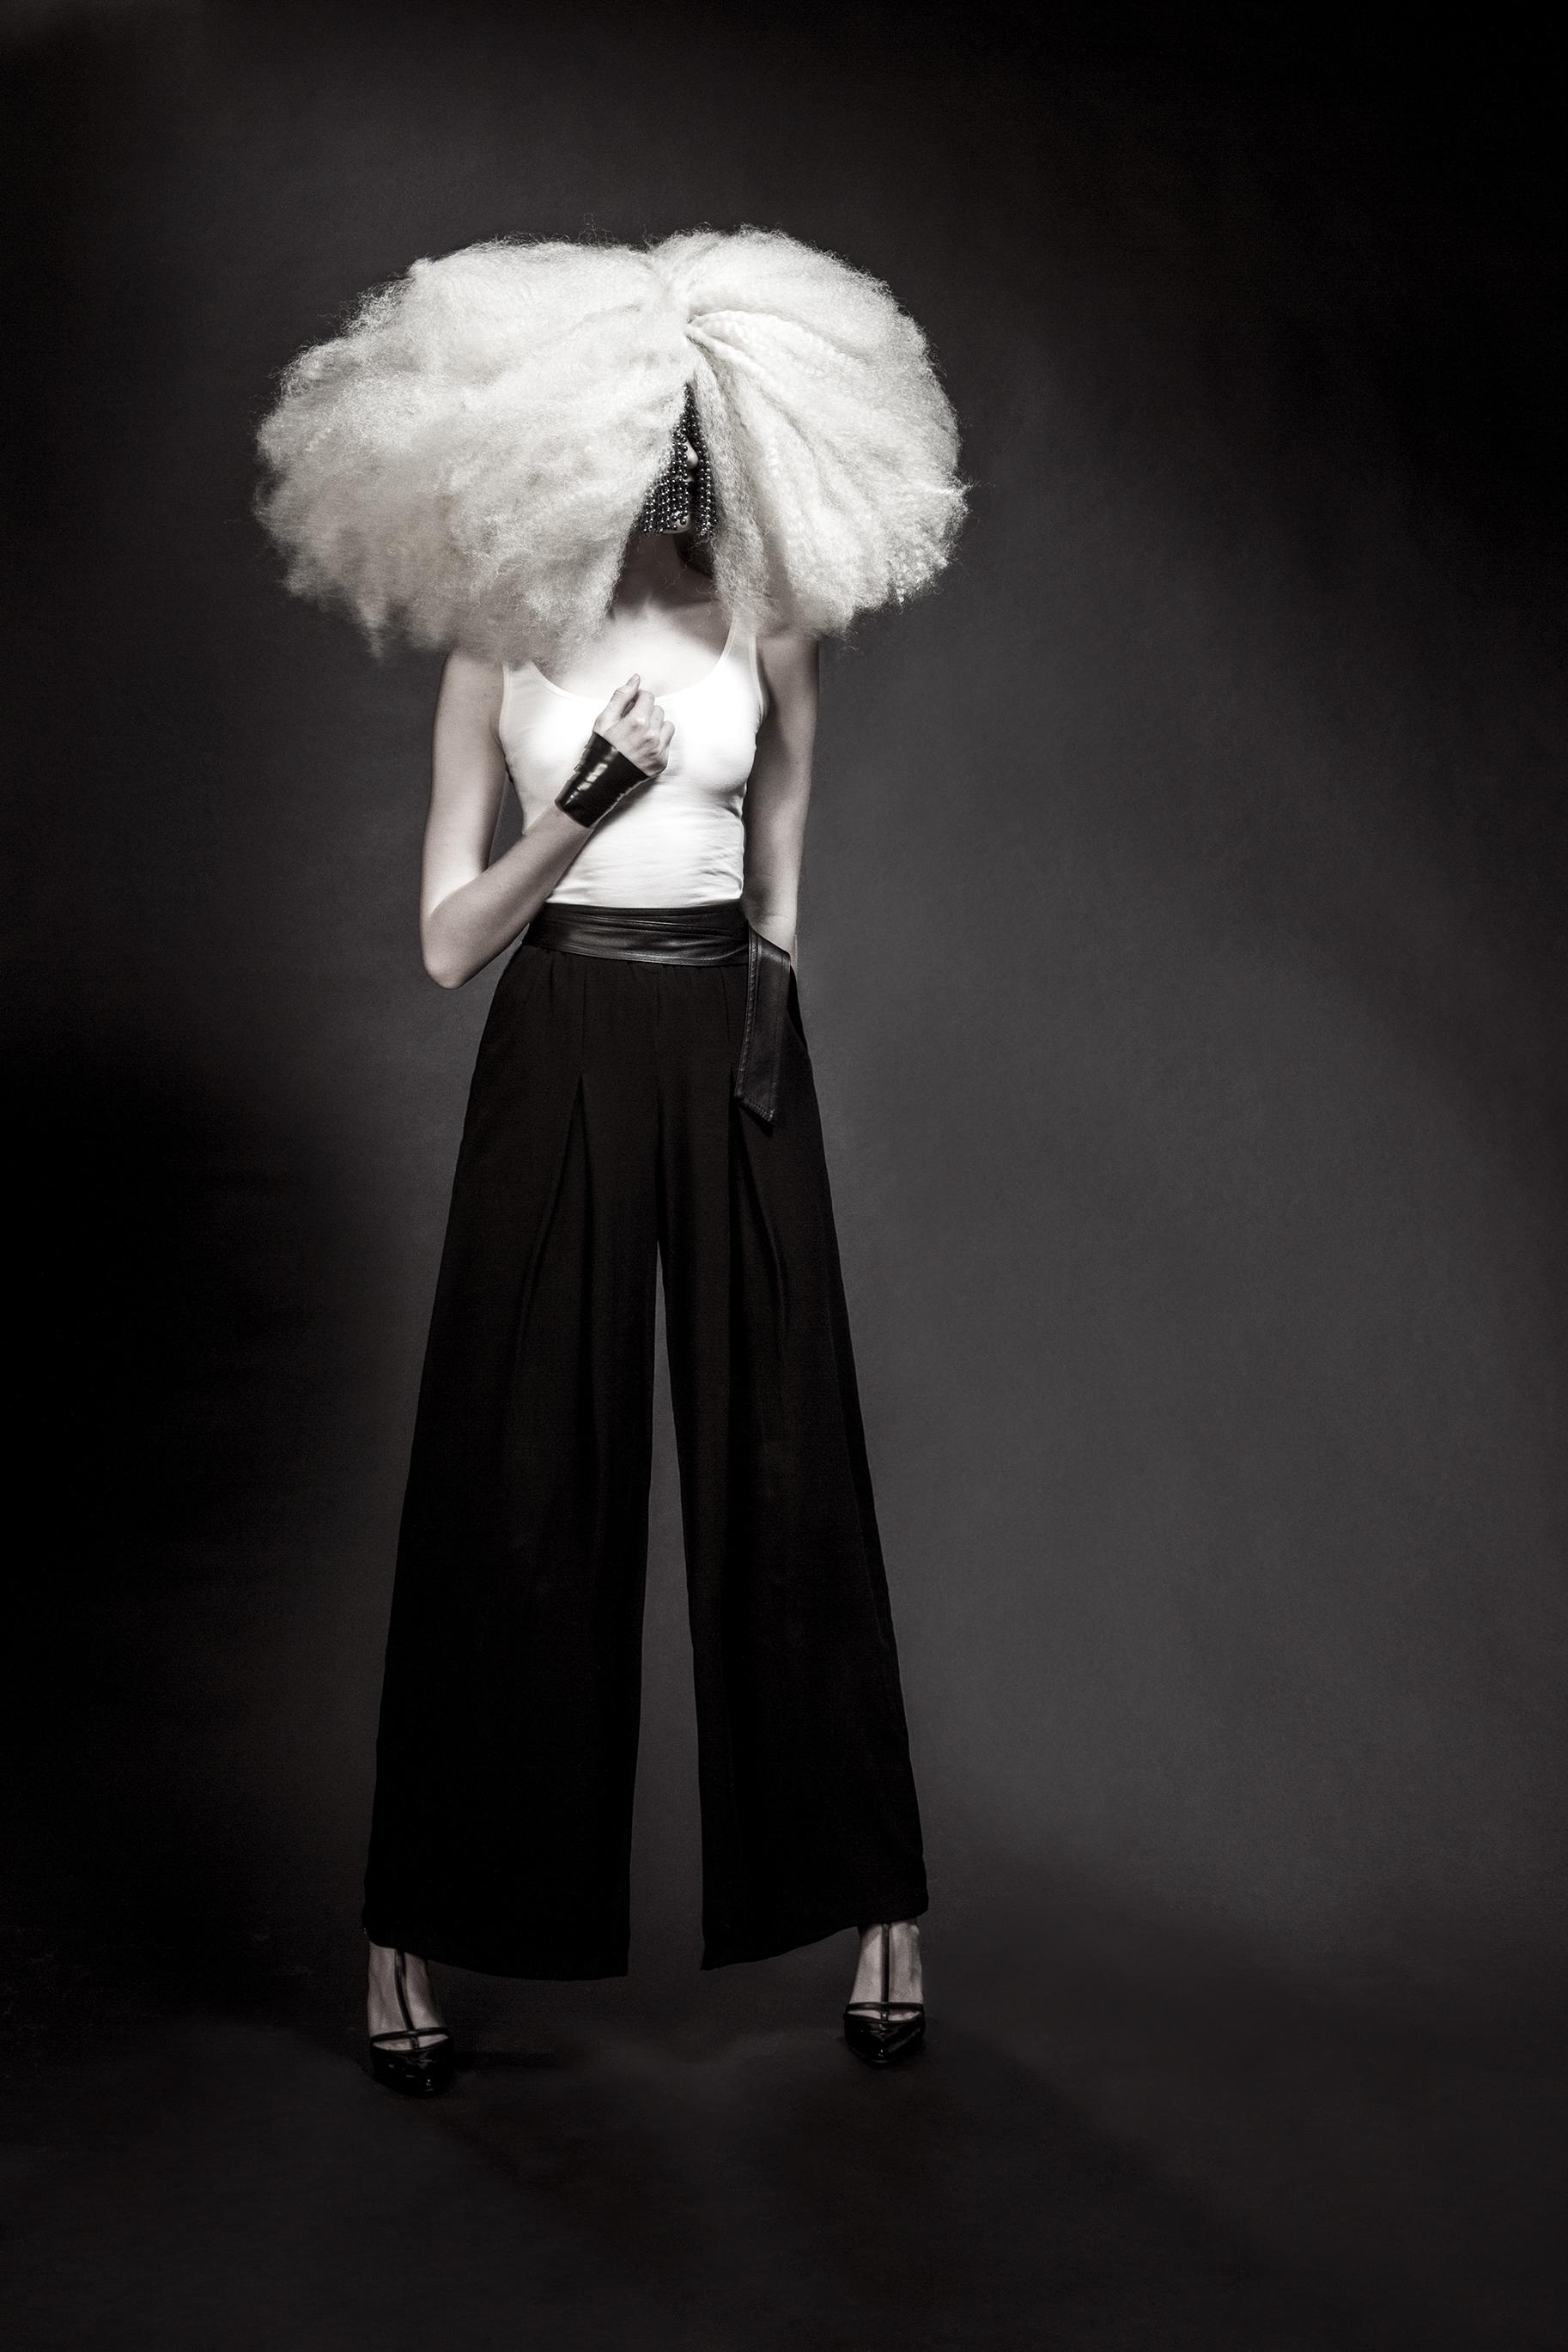 fashion-edgy-editorial-dark-gothic-bighair-platinum-blonde-moody-leather-sleek-black-beuty-hombre-makeup-redlip04.jpg